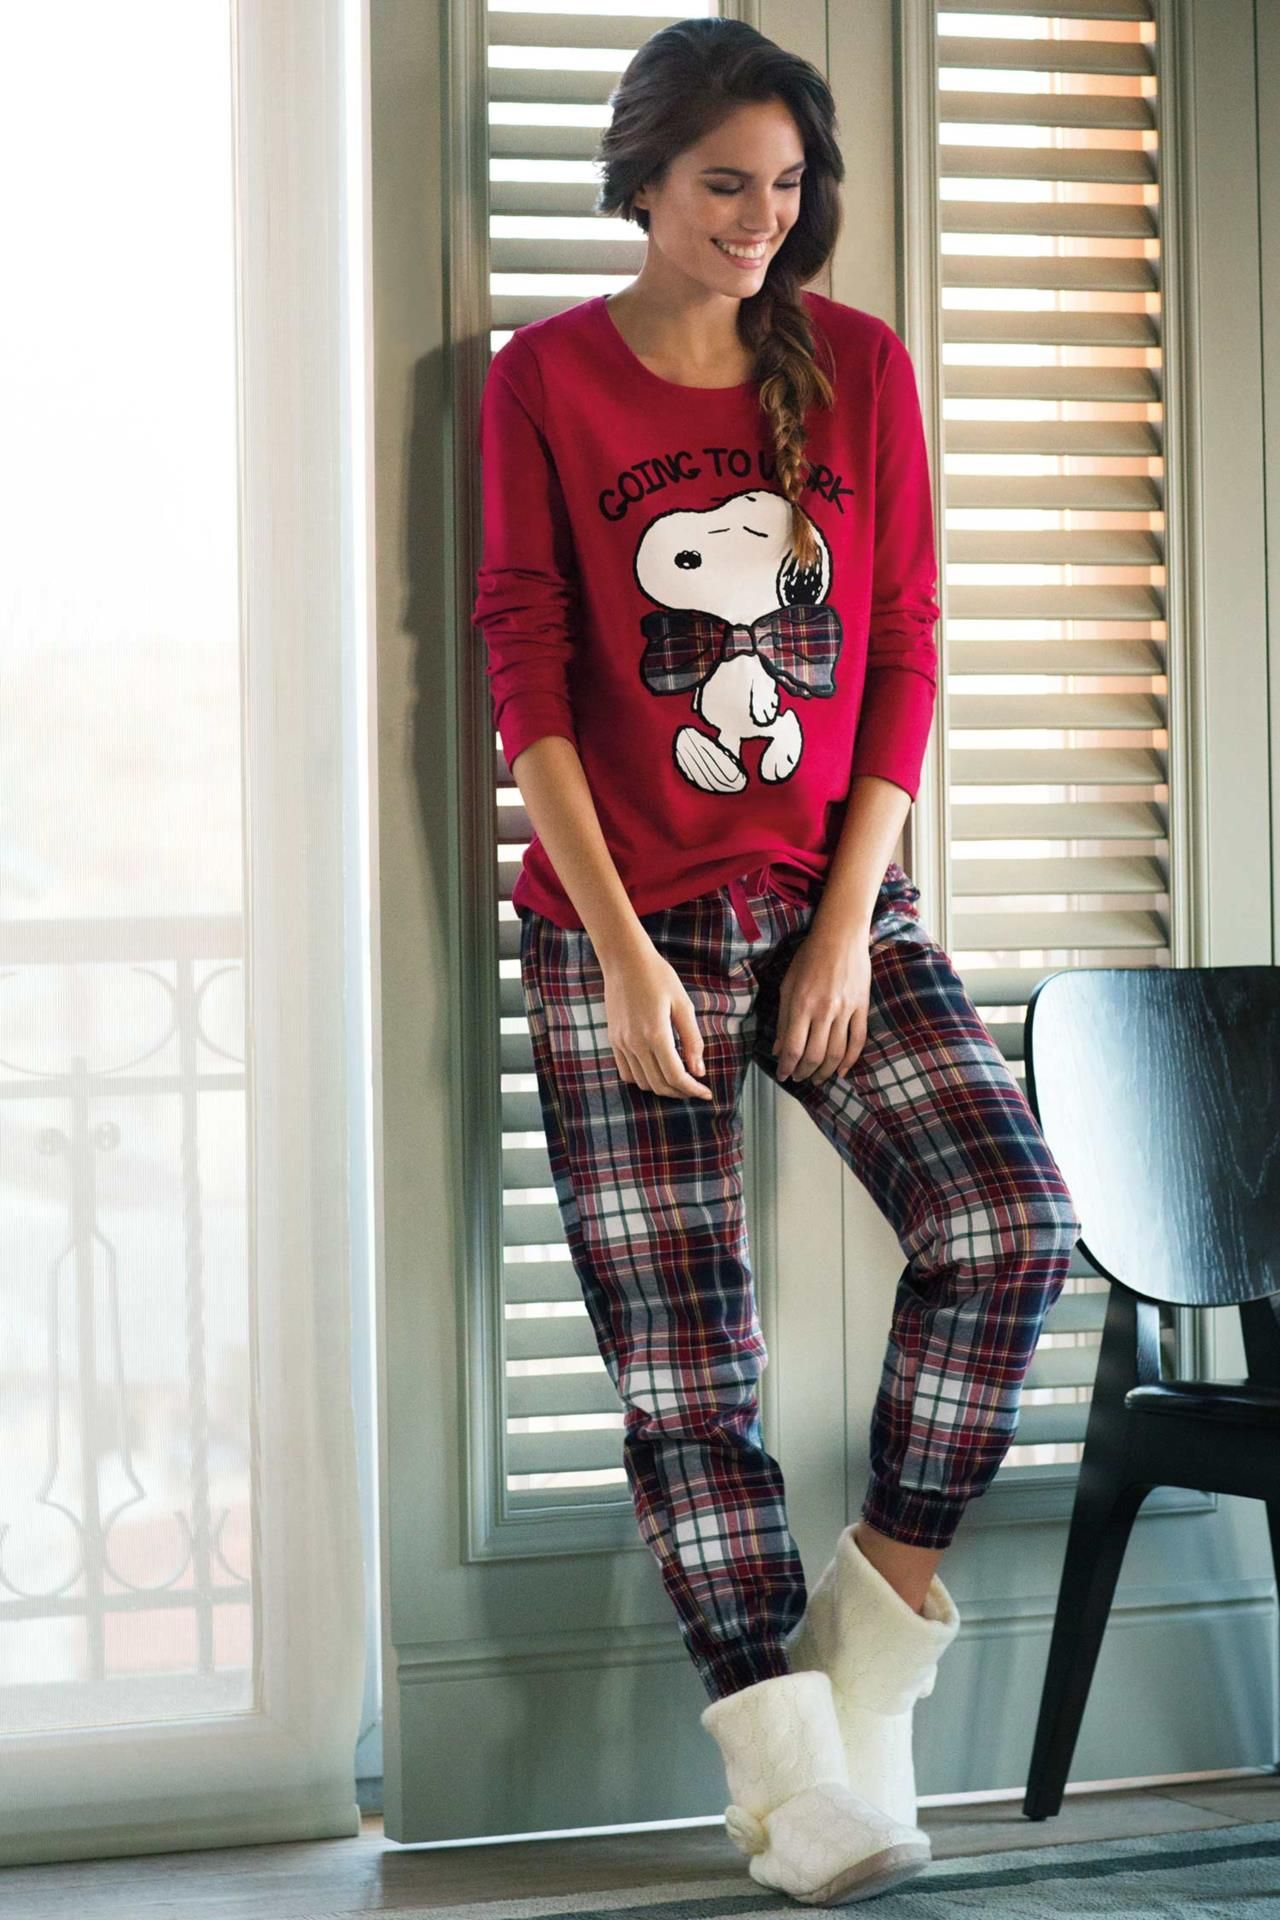 d92ad2b92 Snoopyyyy Pijama De Inverno Feminino